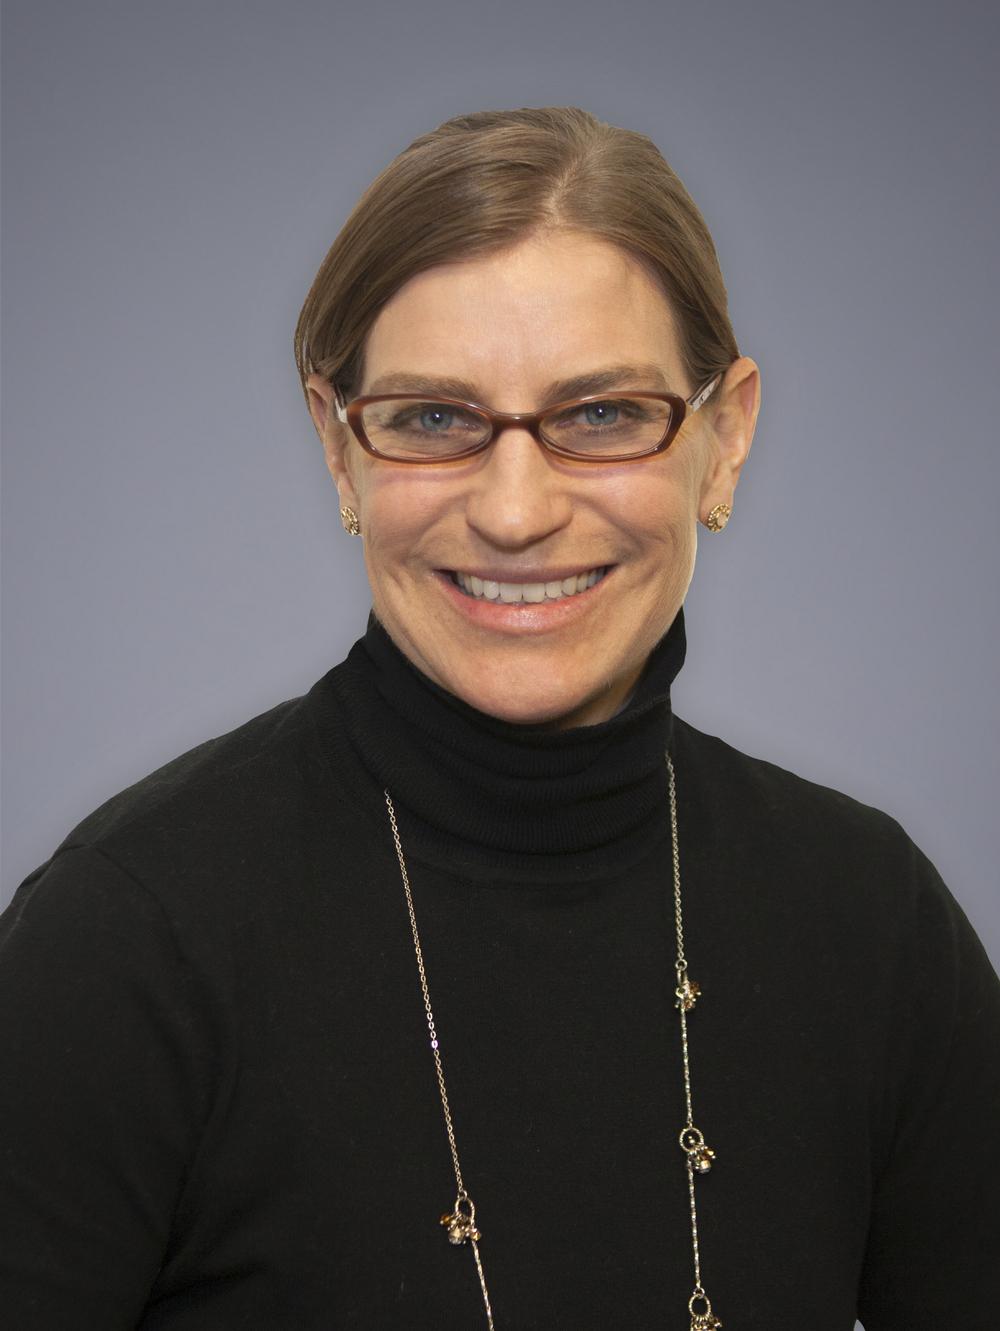 Sandra Holmberg